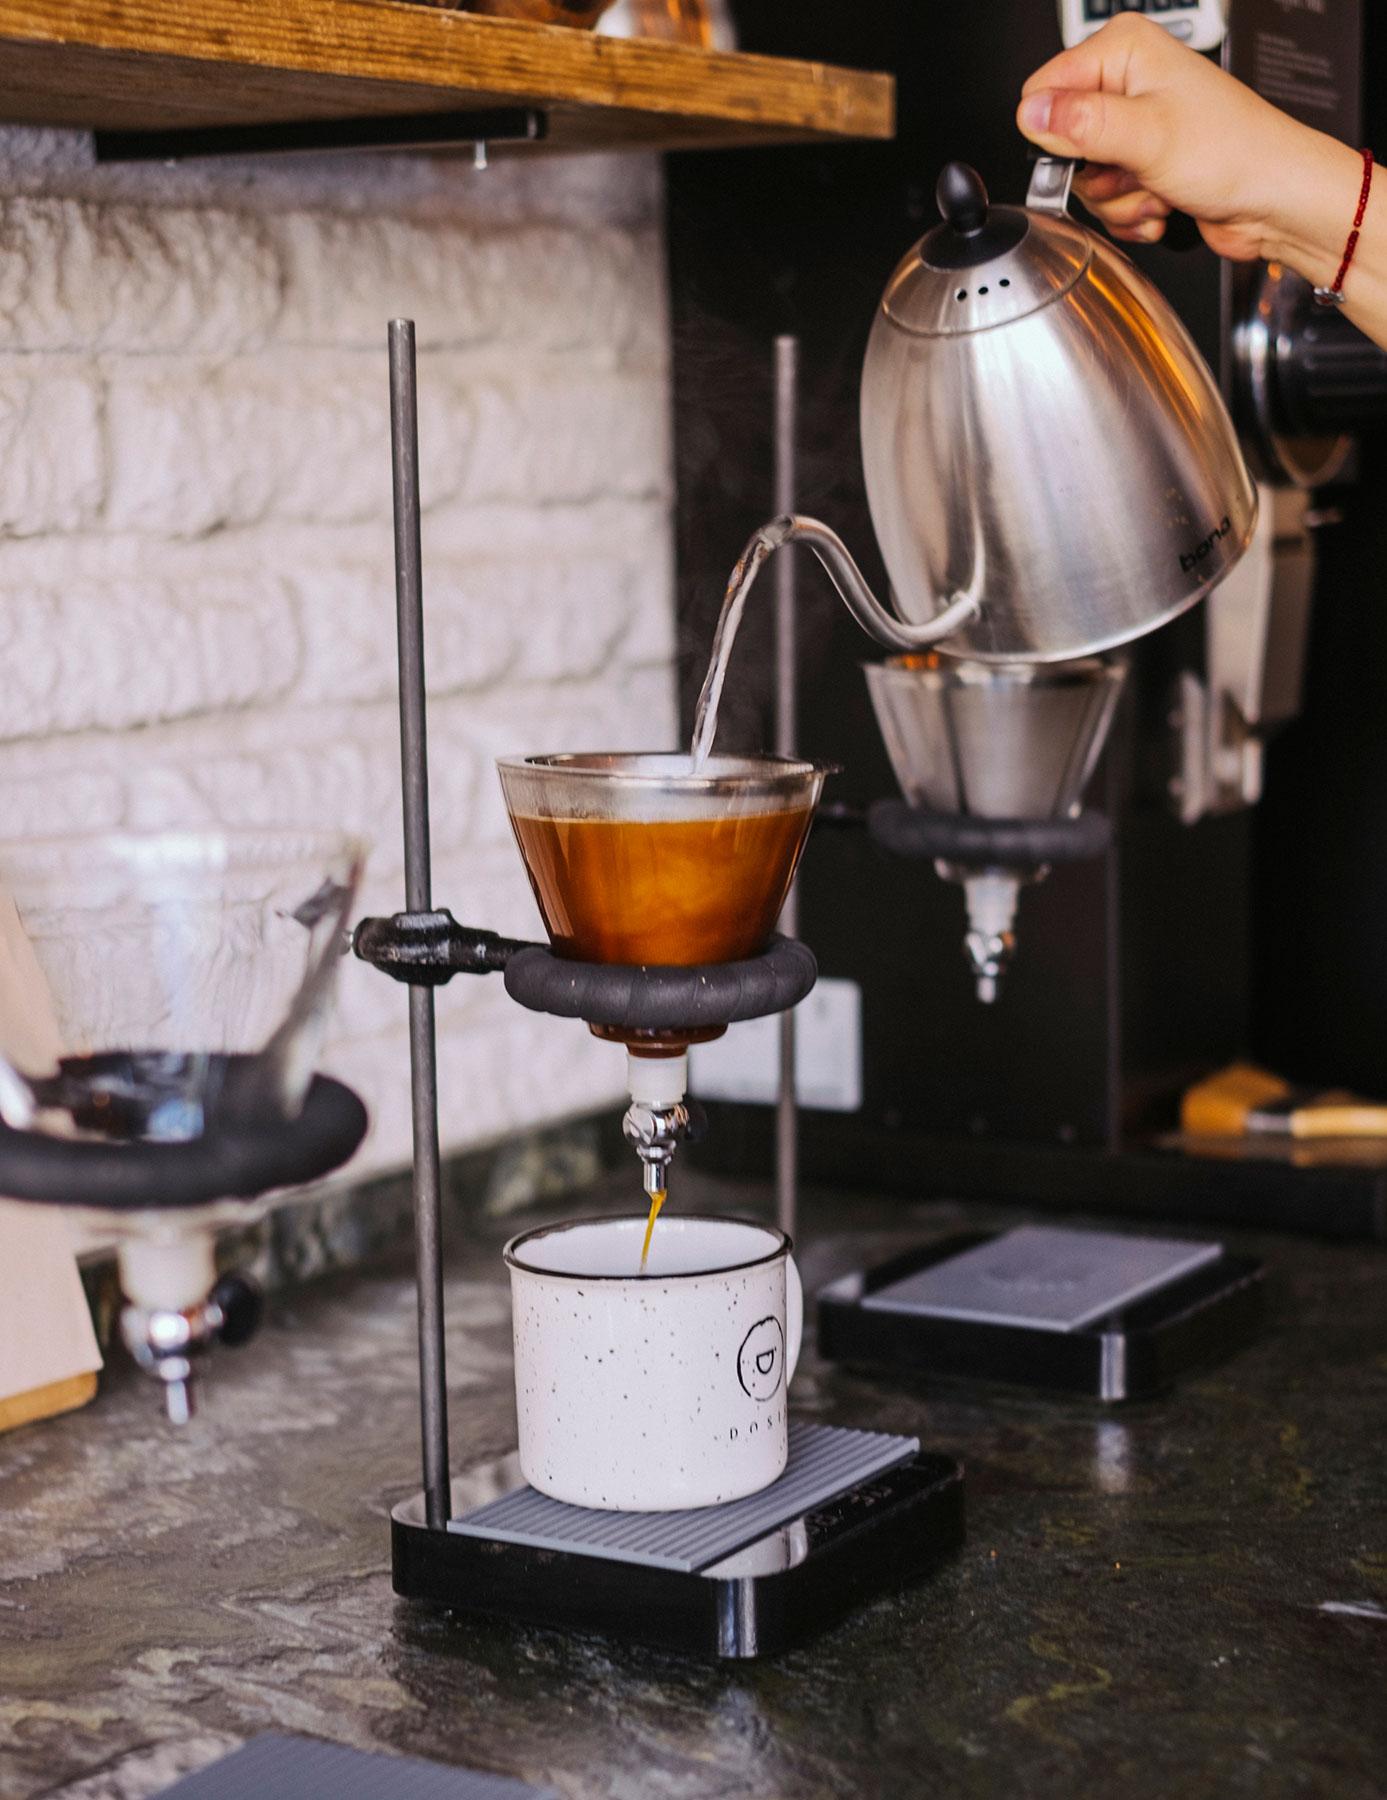 dosis-mexico-city-coffee-shop.jpg